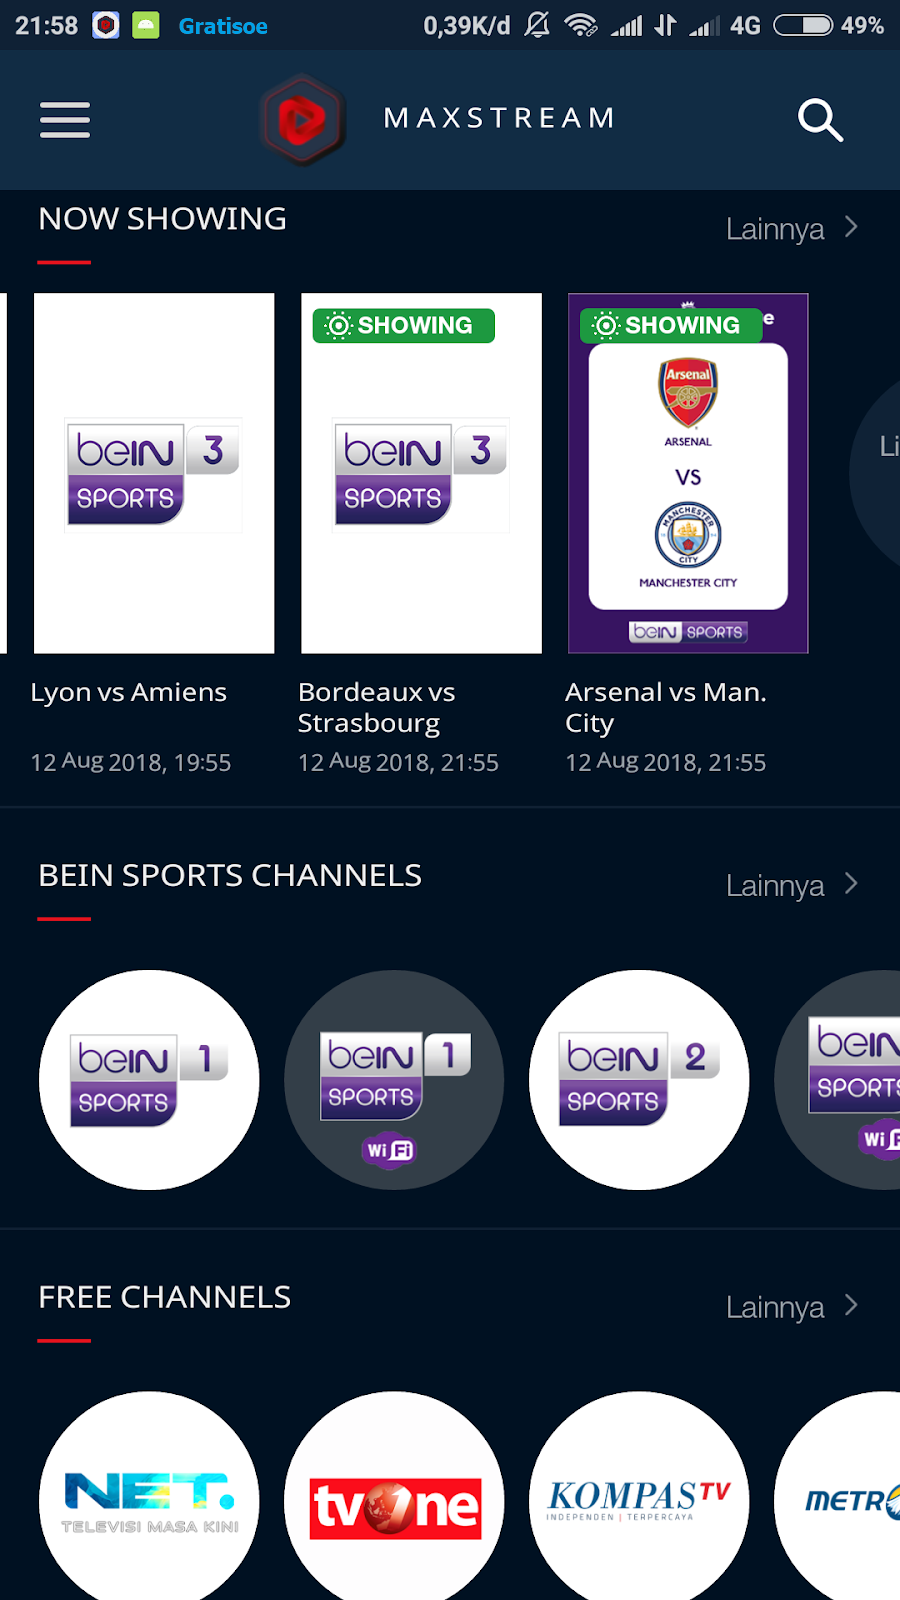 Aplikasi Maxstream Telkomsel Bisa Buat Nonton Streaming Bola Liga